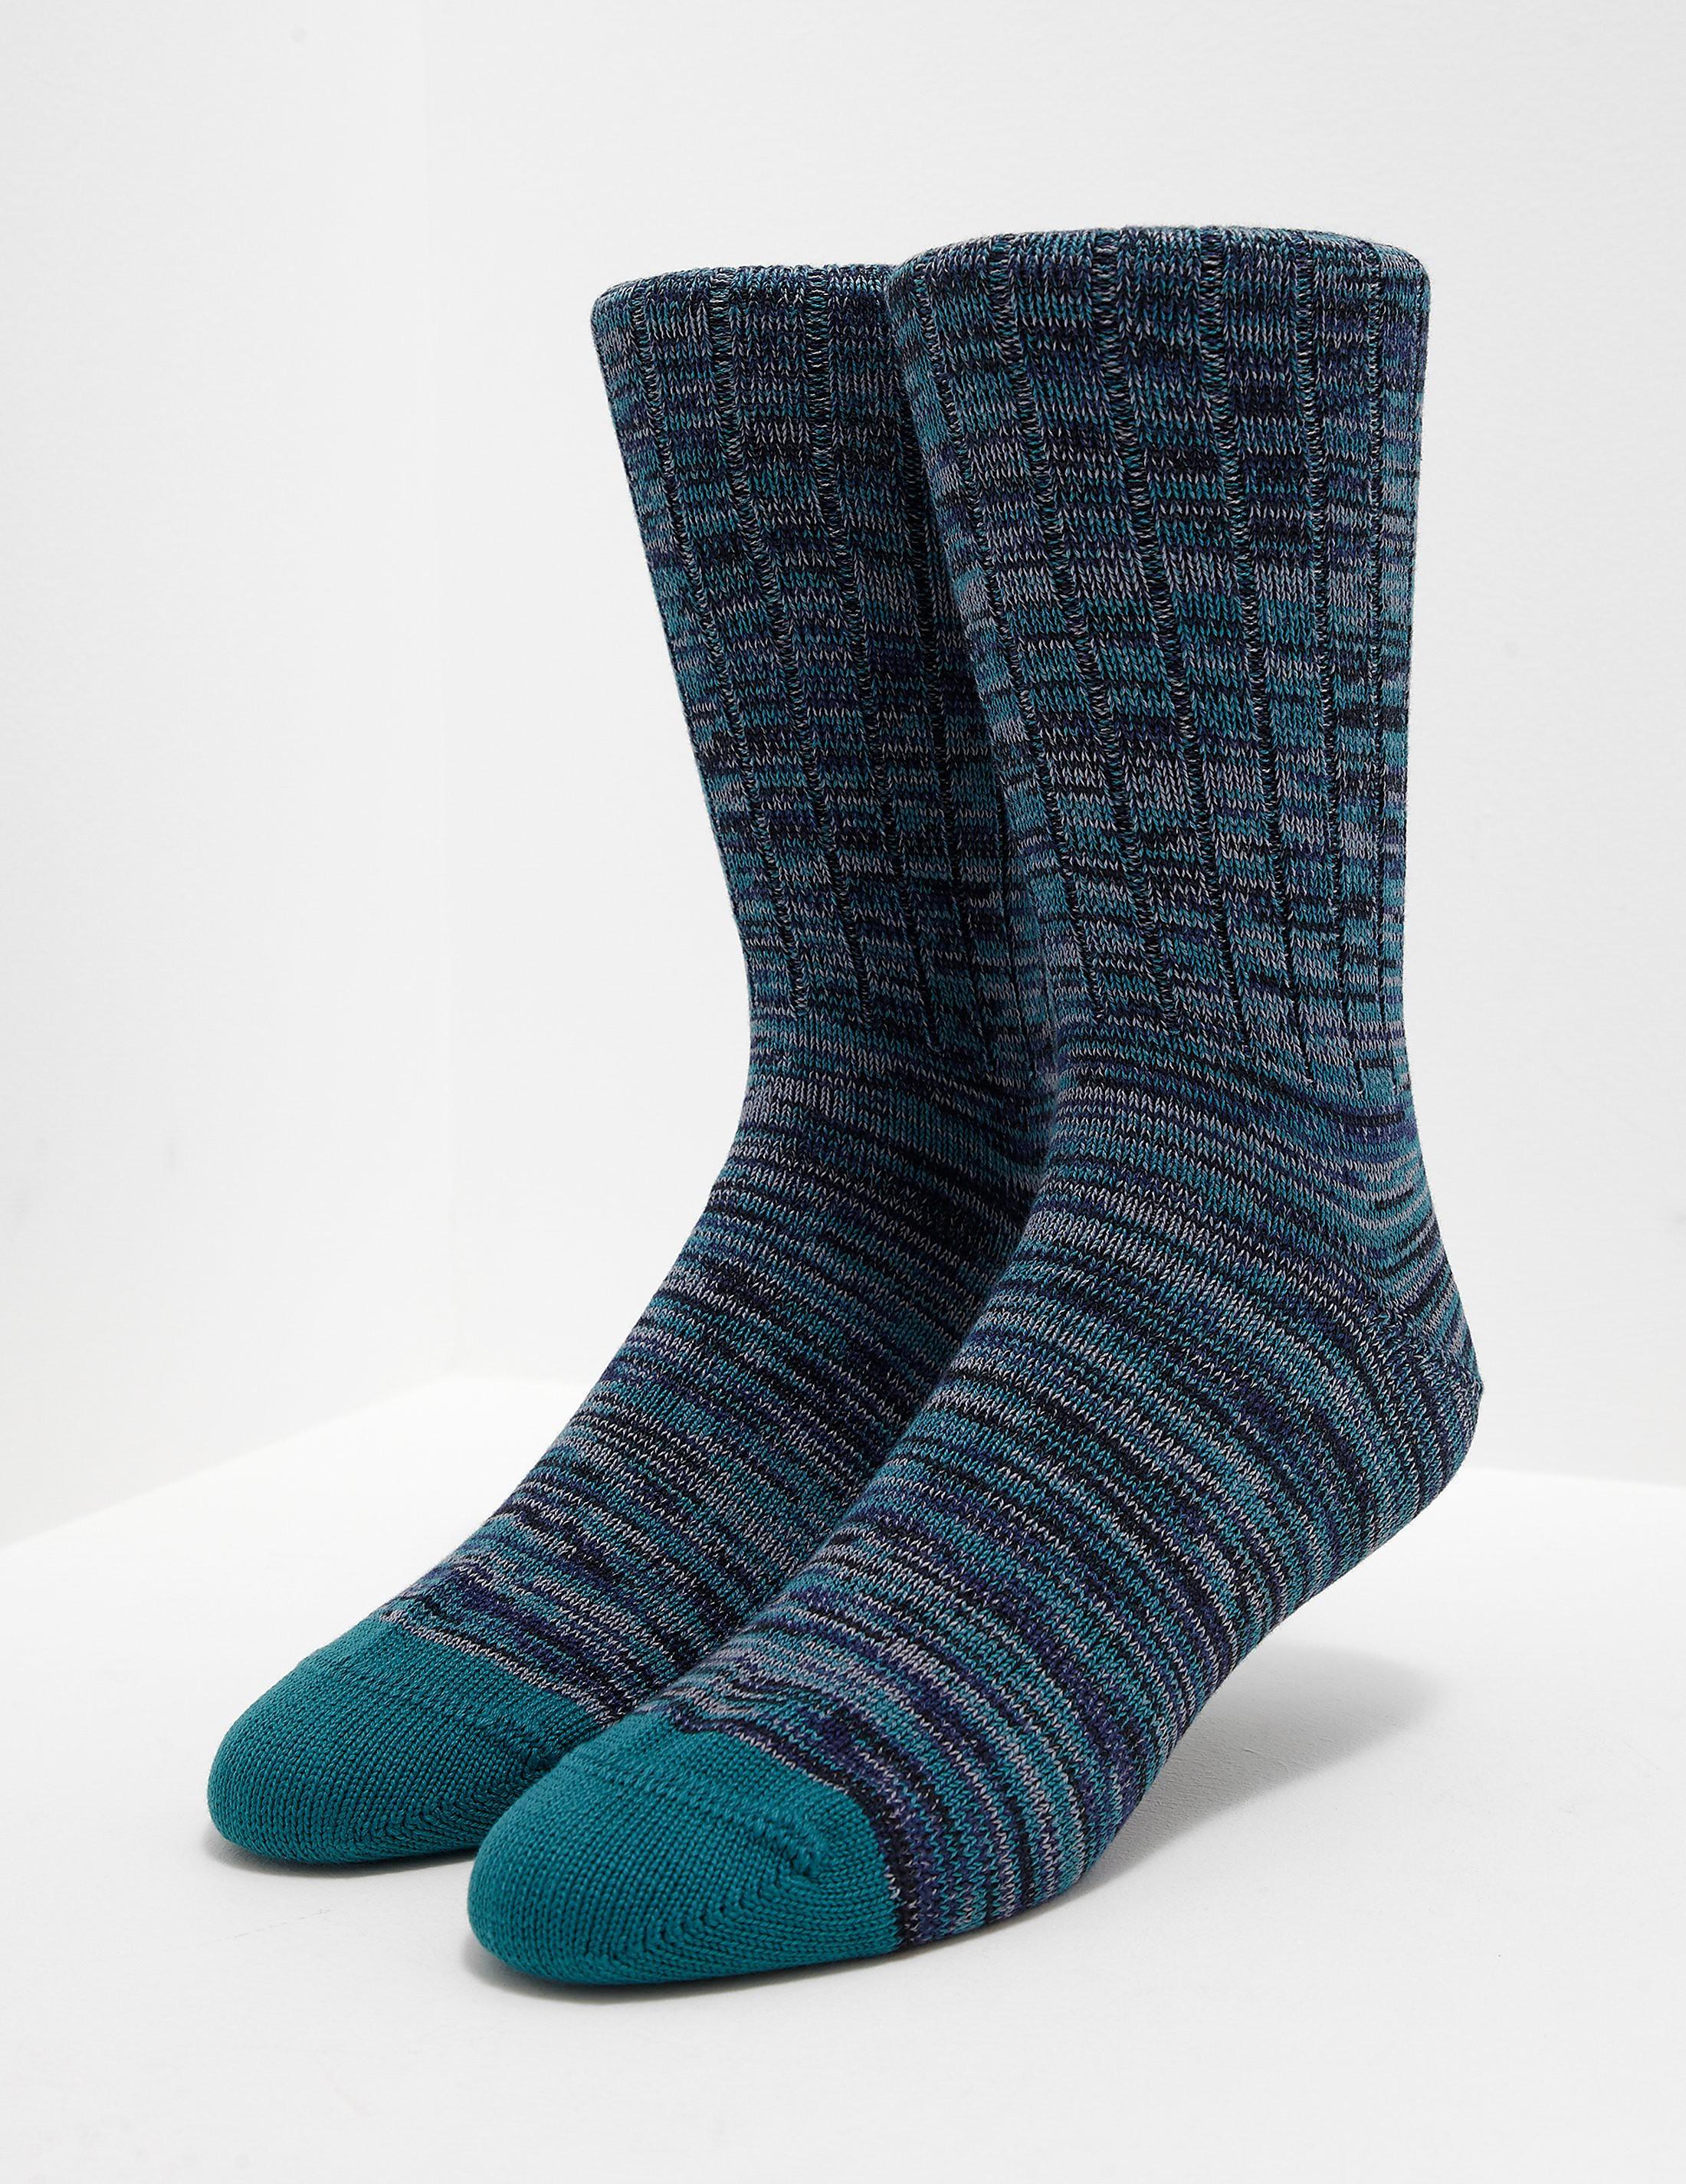 Paul Smith Quad Twist Socks